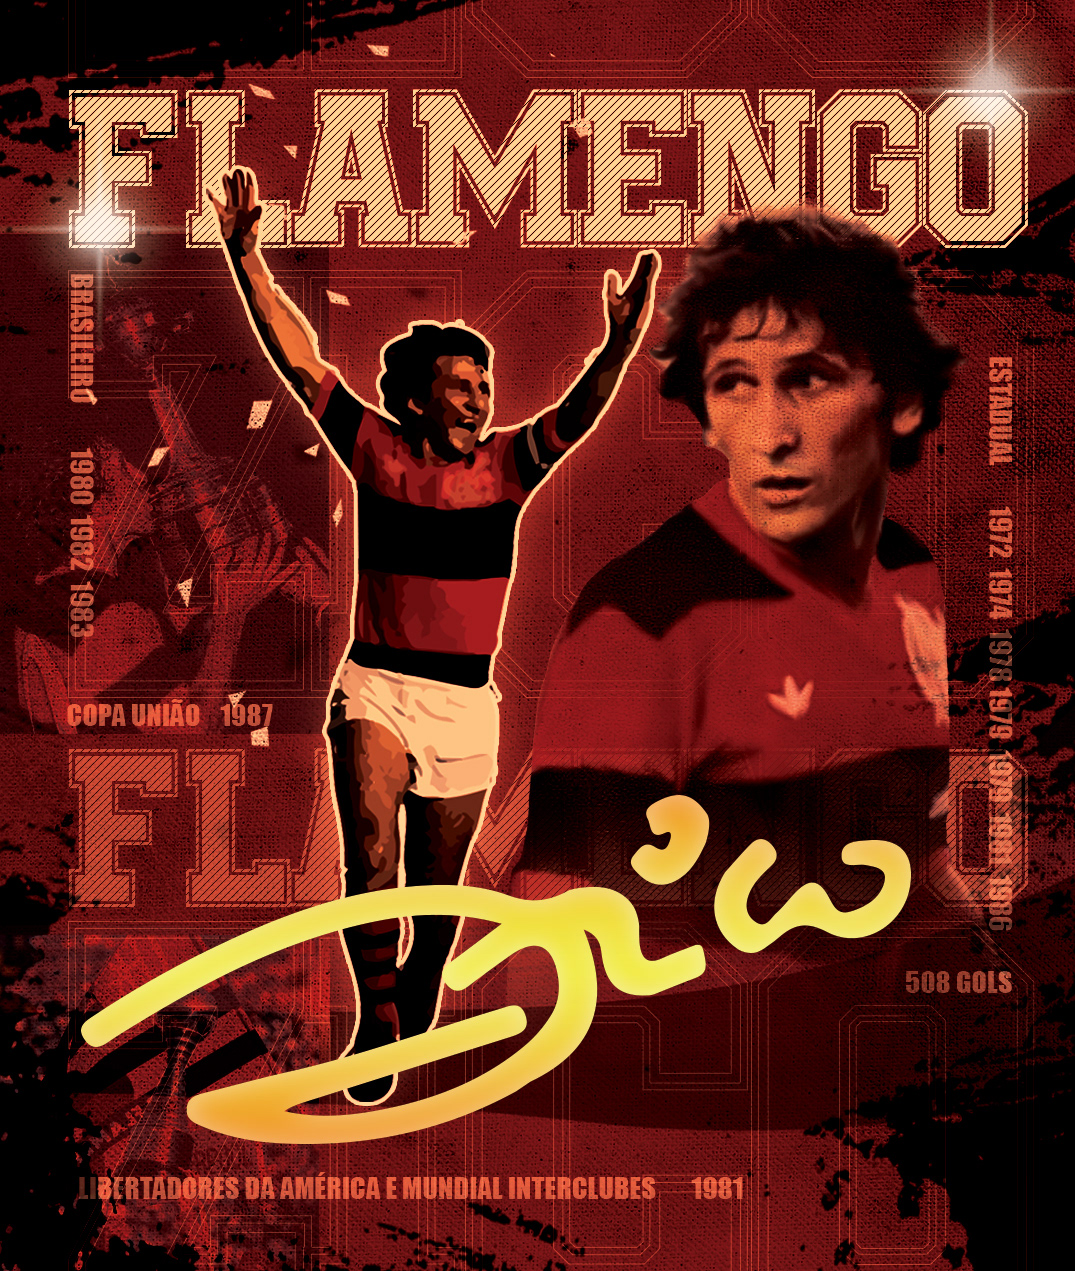 flamengo futebol impresso Zico